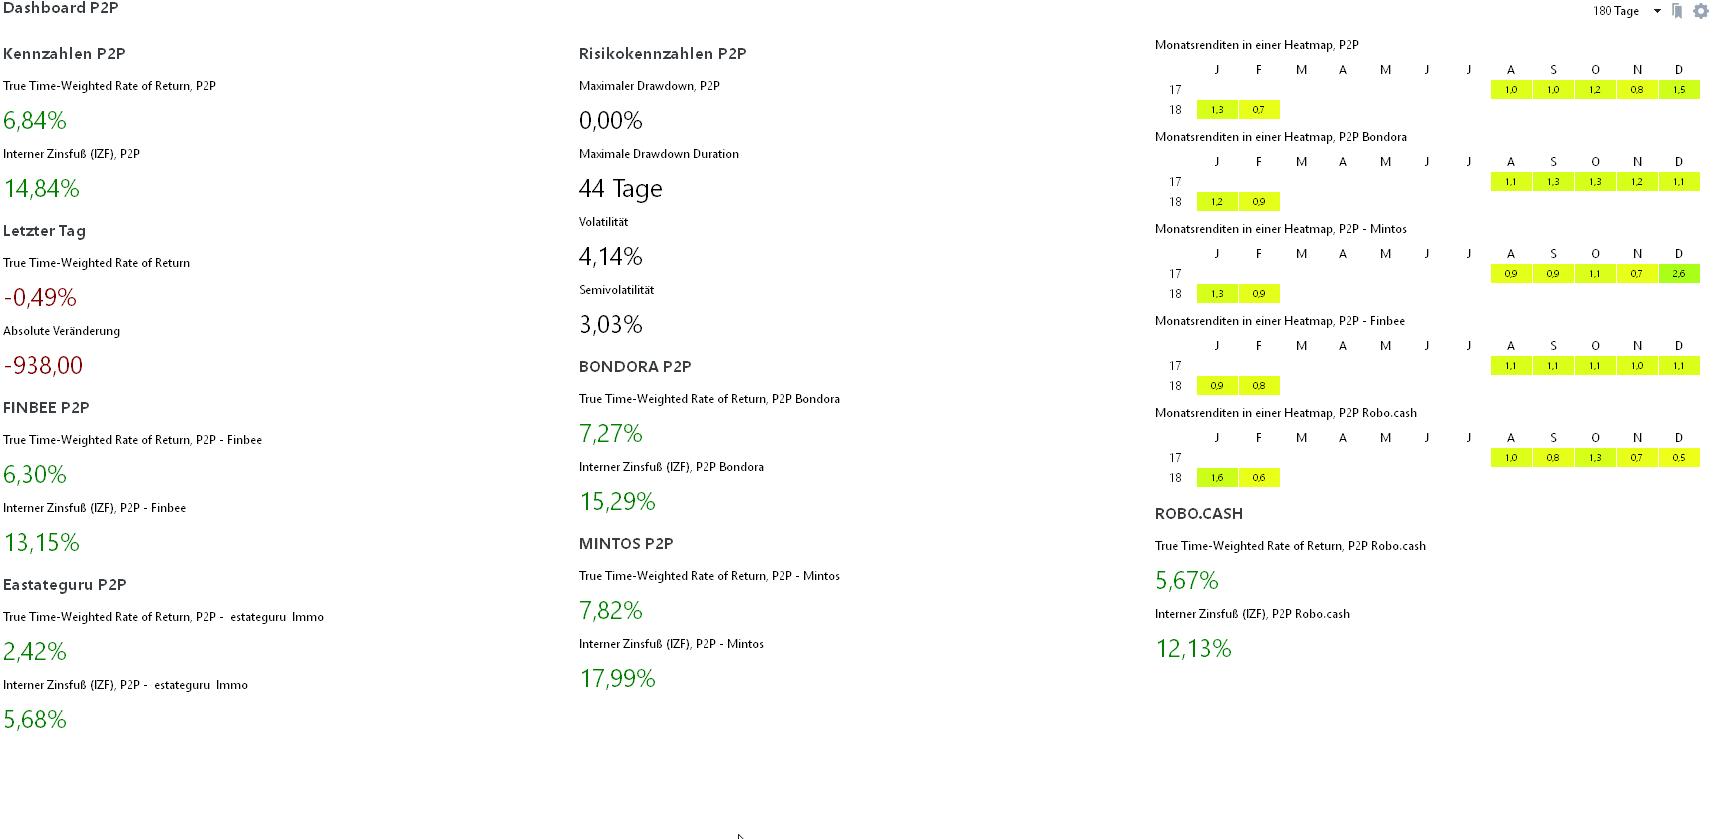 P2P Performance Heatmap Portfolio Performance